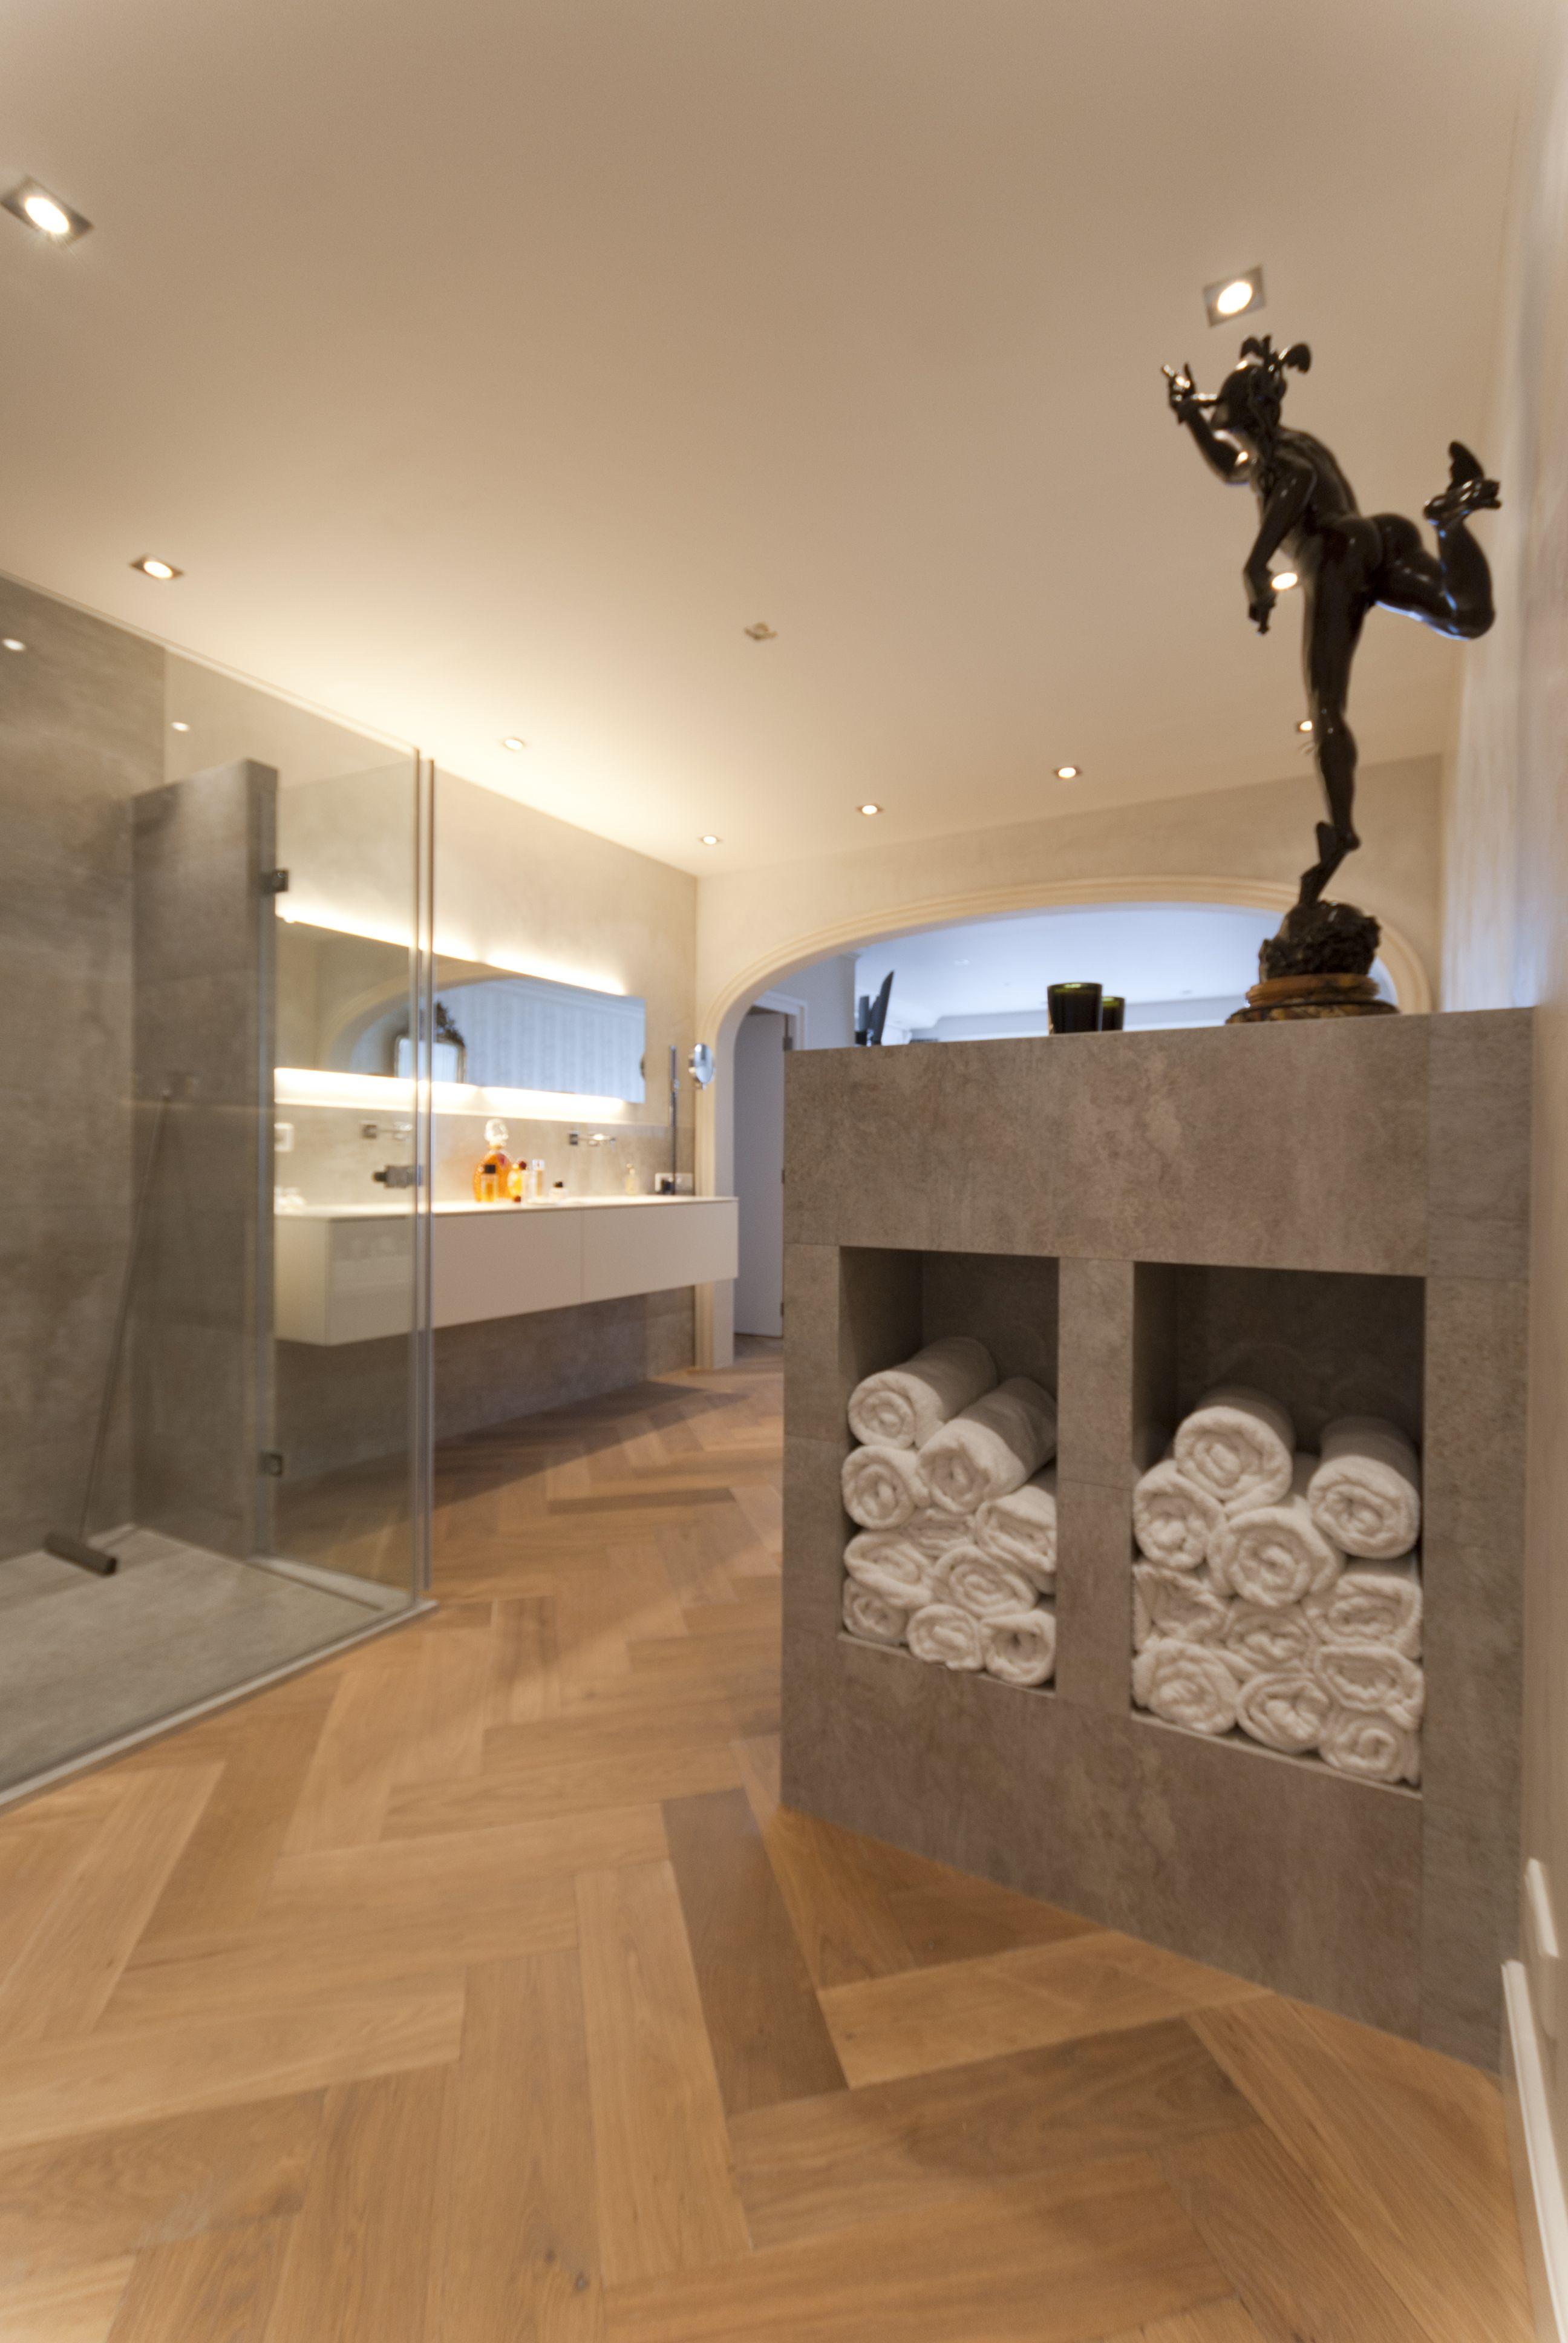 2 grote nissen tbv. handdoeken. Made by: Tegelhuis Badkamers en ...